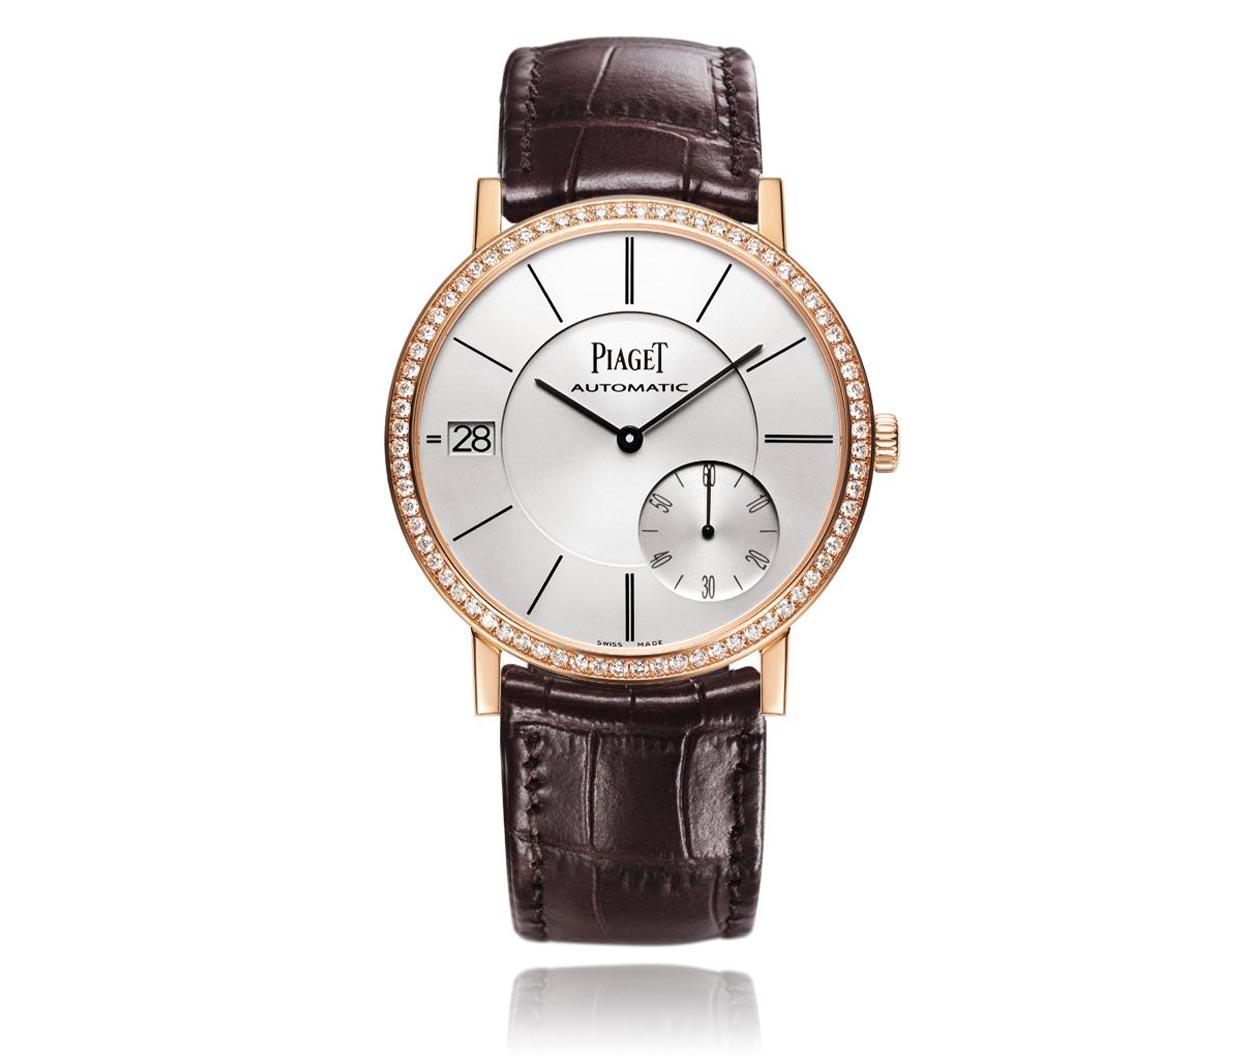 Piaget Altiplano watch G0A38139 Carousel 1 FINAL